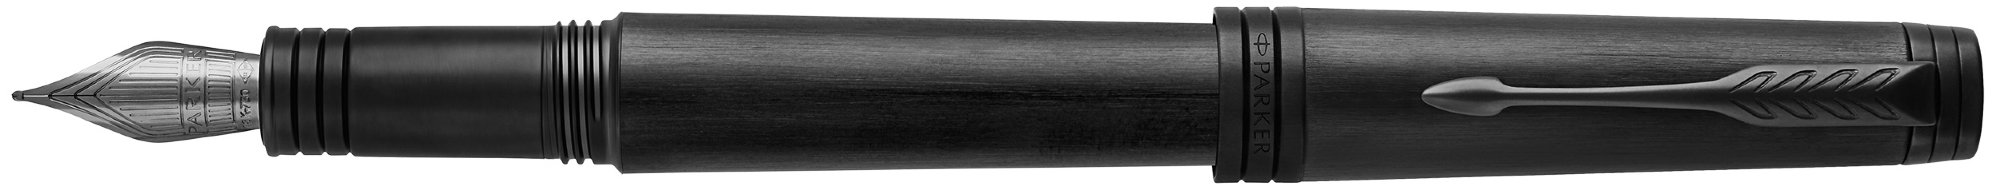 Перьевая ручка Parker Premier F564 Monochrome Black в Воронеже